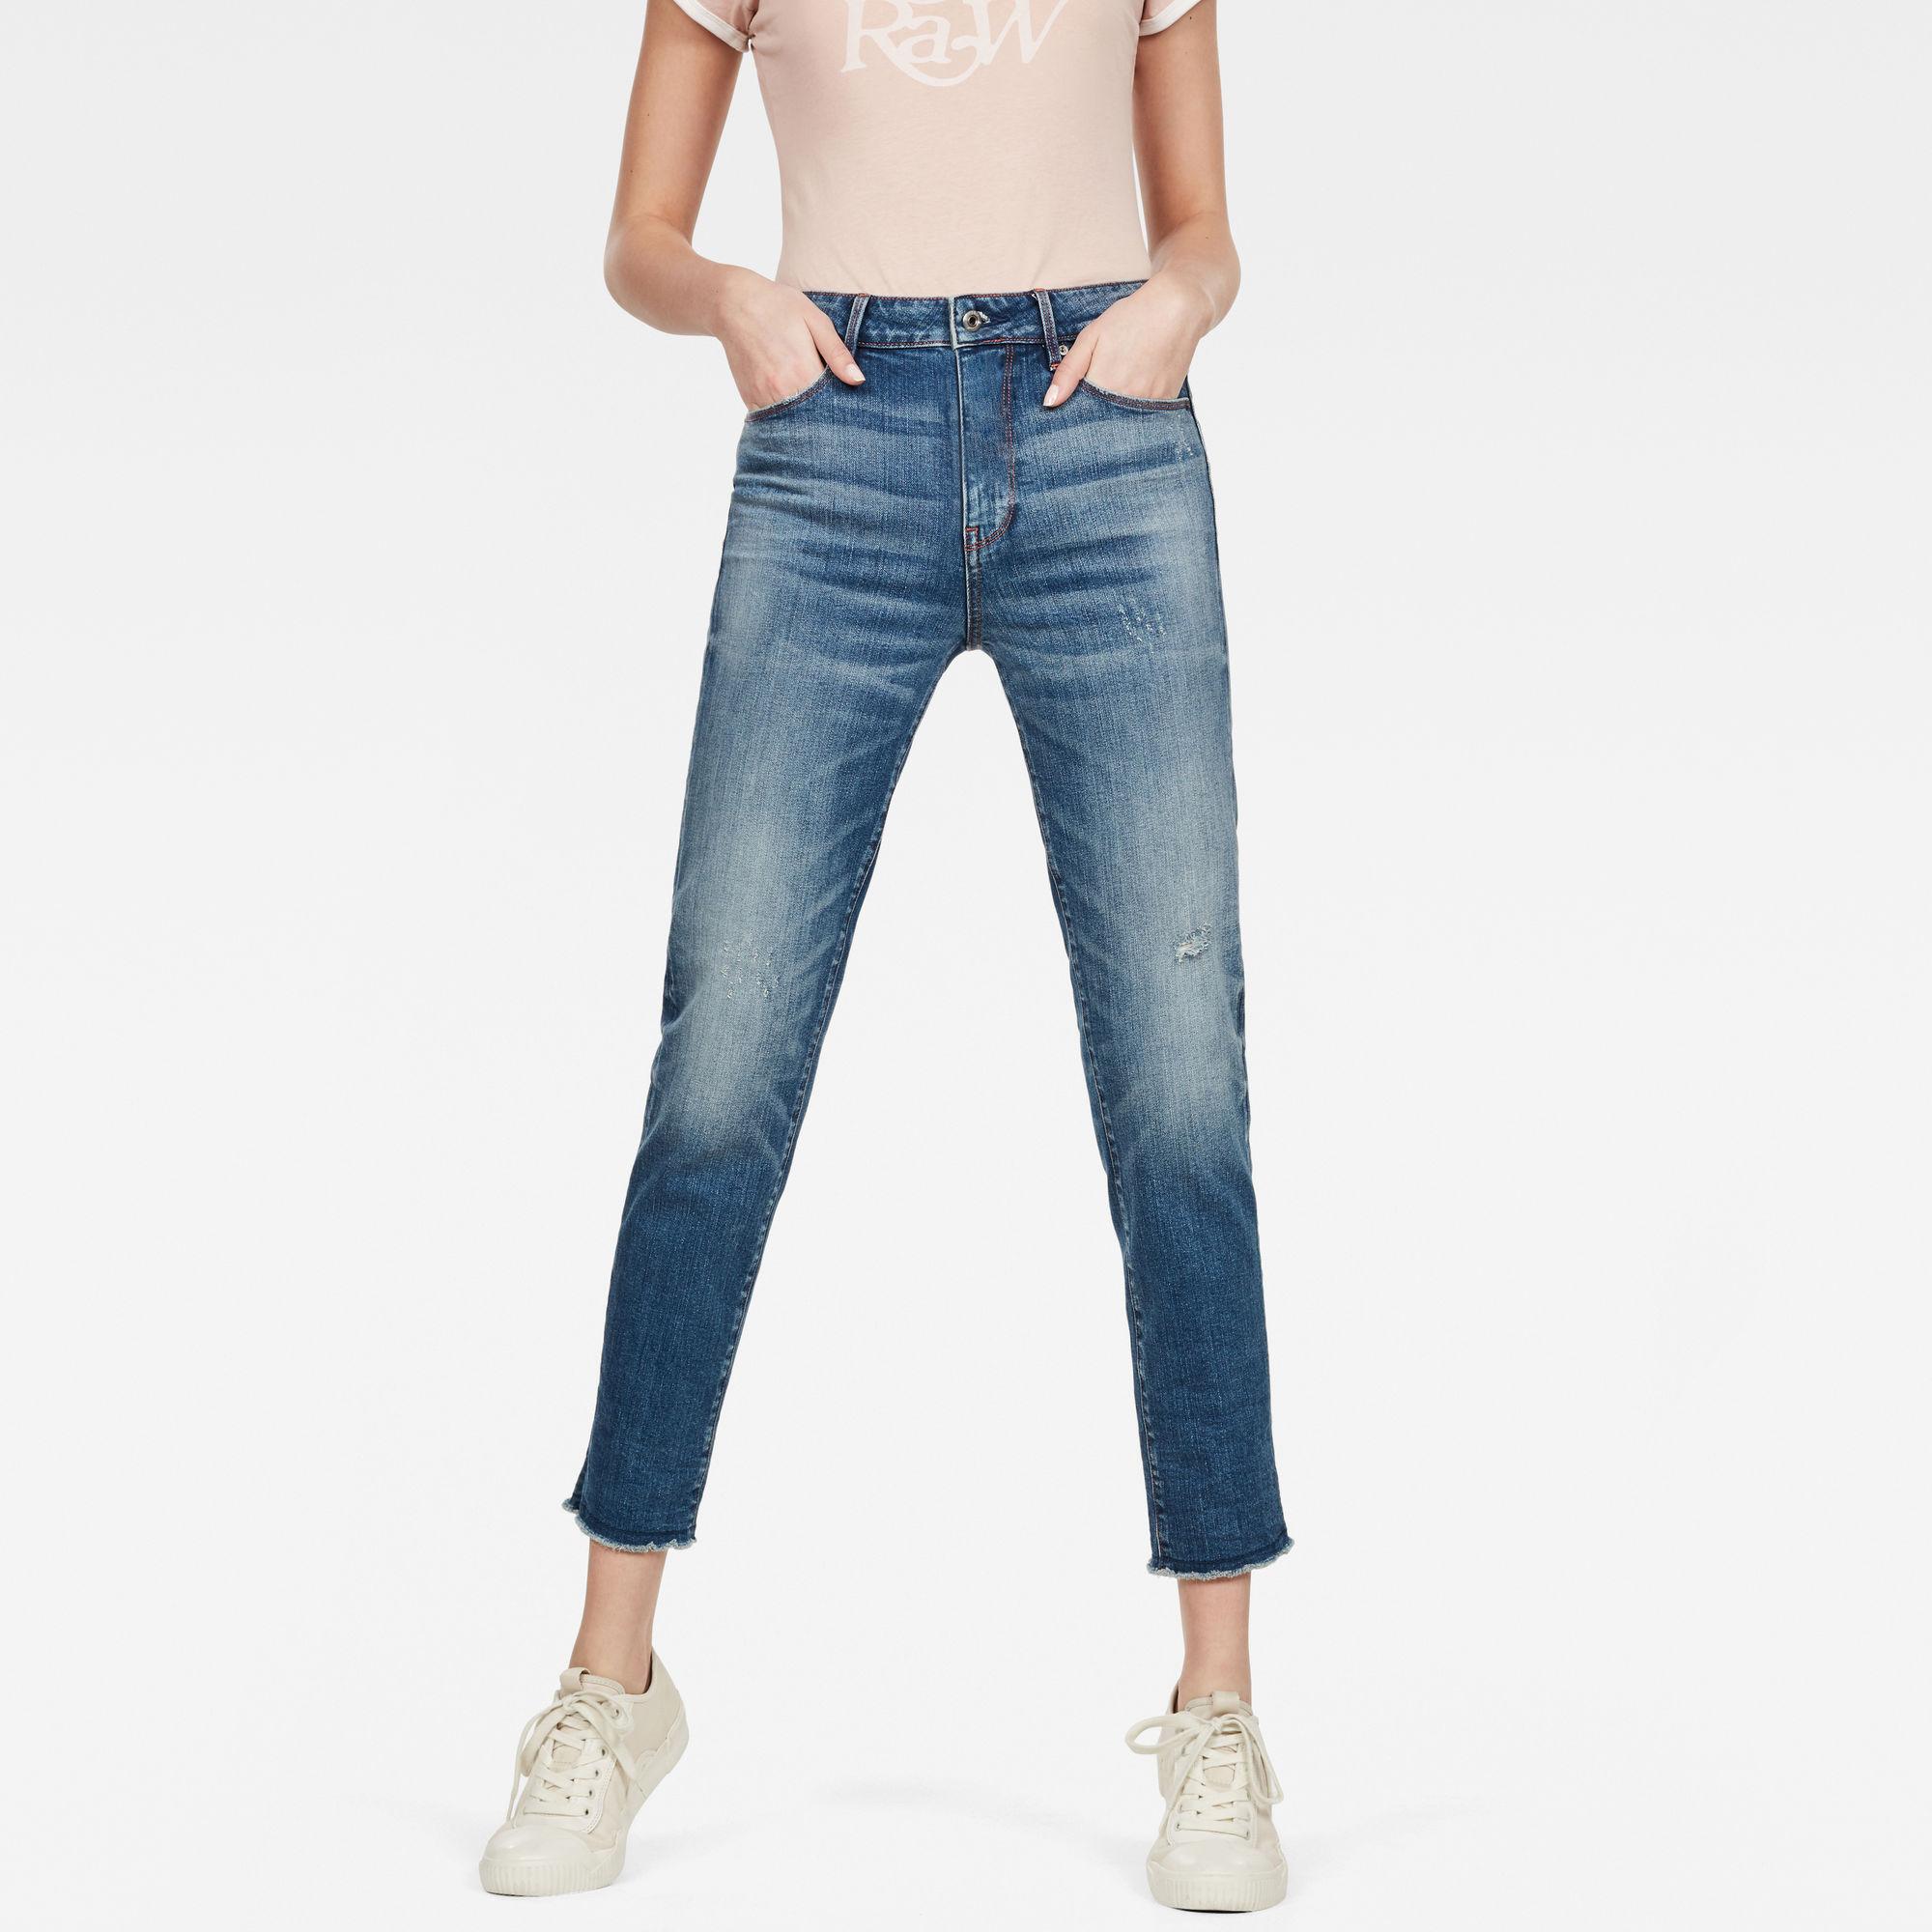 Van G Star Raw 3301 RP High Straight Ankle Jeans Prijsvergelijk nu!